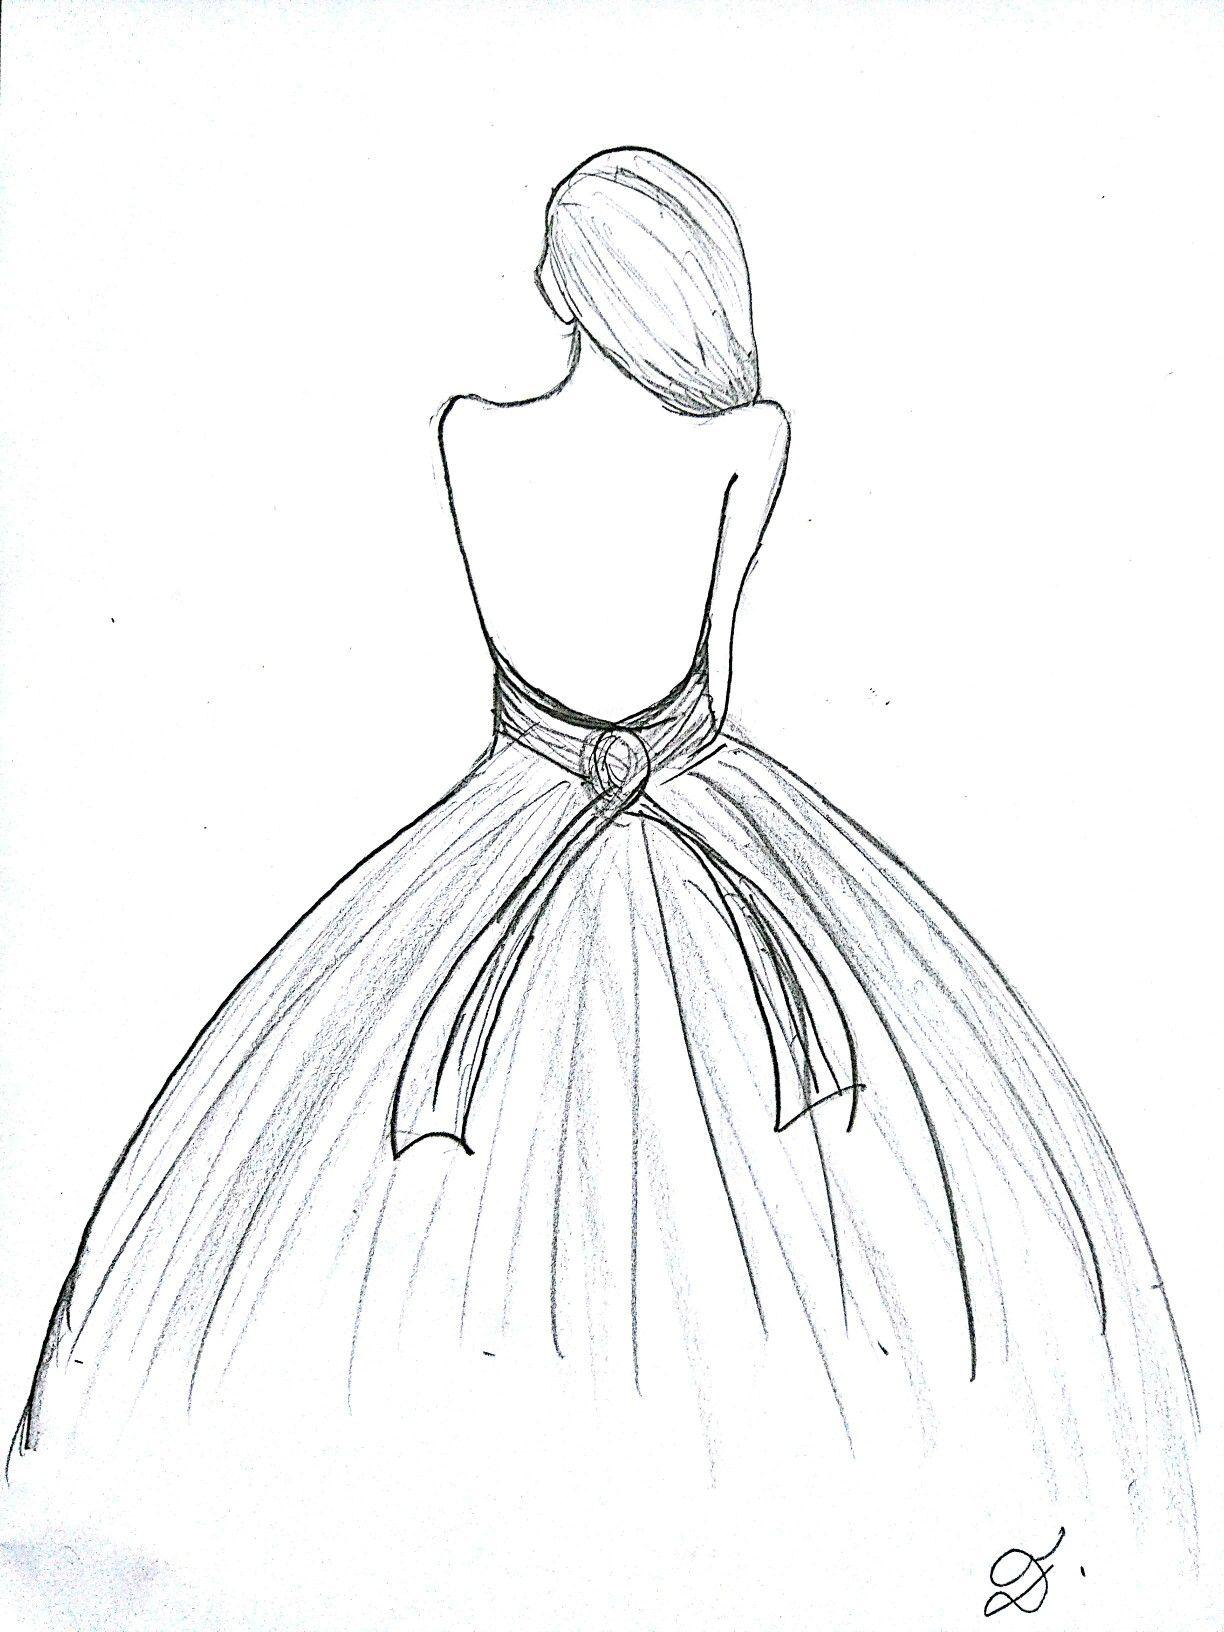 Pin By Varsha Balekkala On Art Dress Design Sketches Cool Art Drawings Fashion Design Drawings